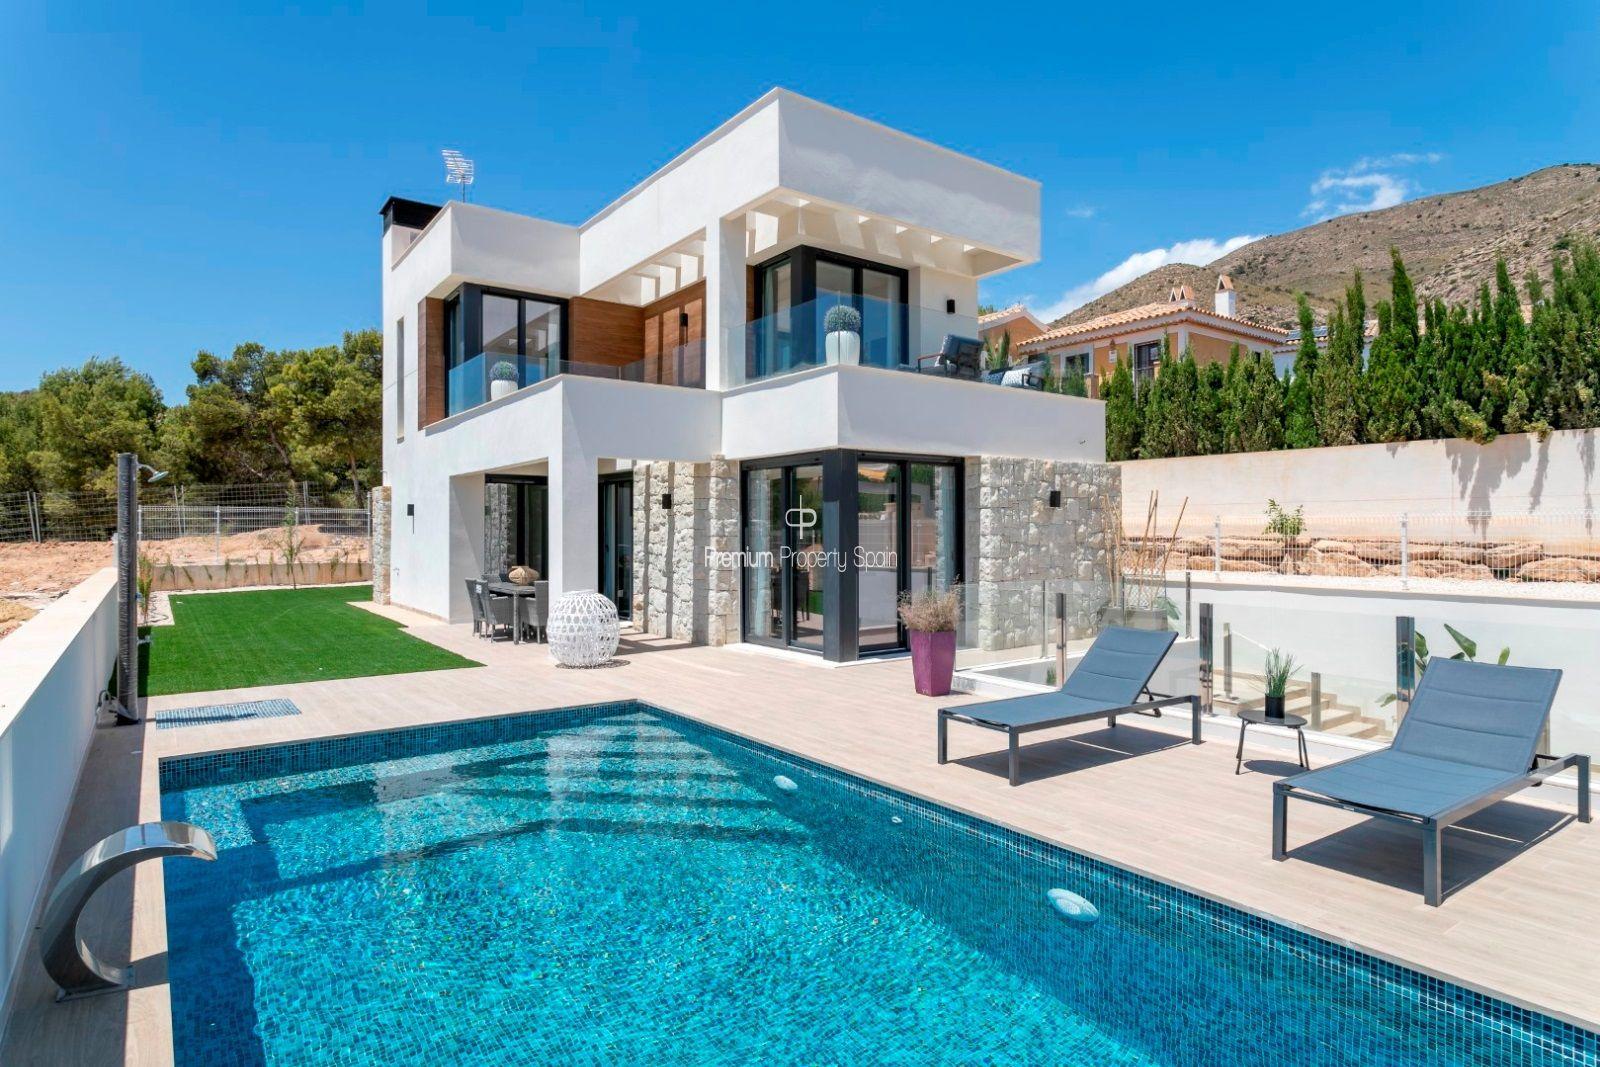 11 Únicas Villas - Sierra Cortina - Costa Blanca - Alicante - España